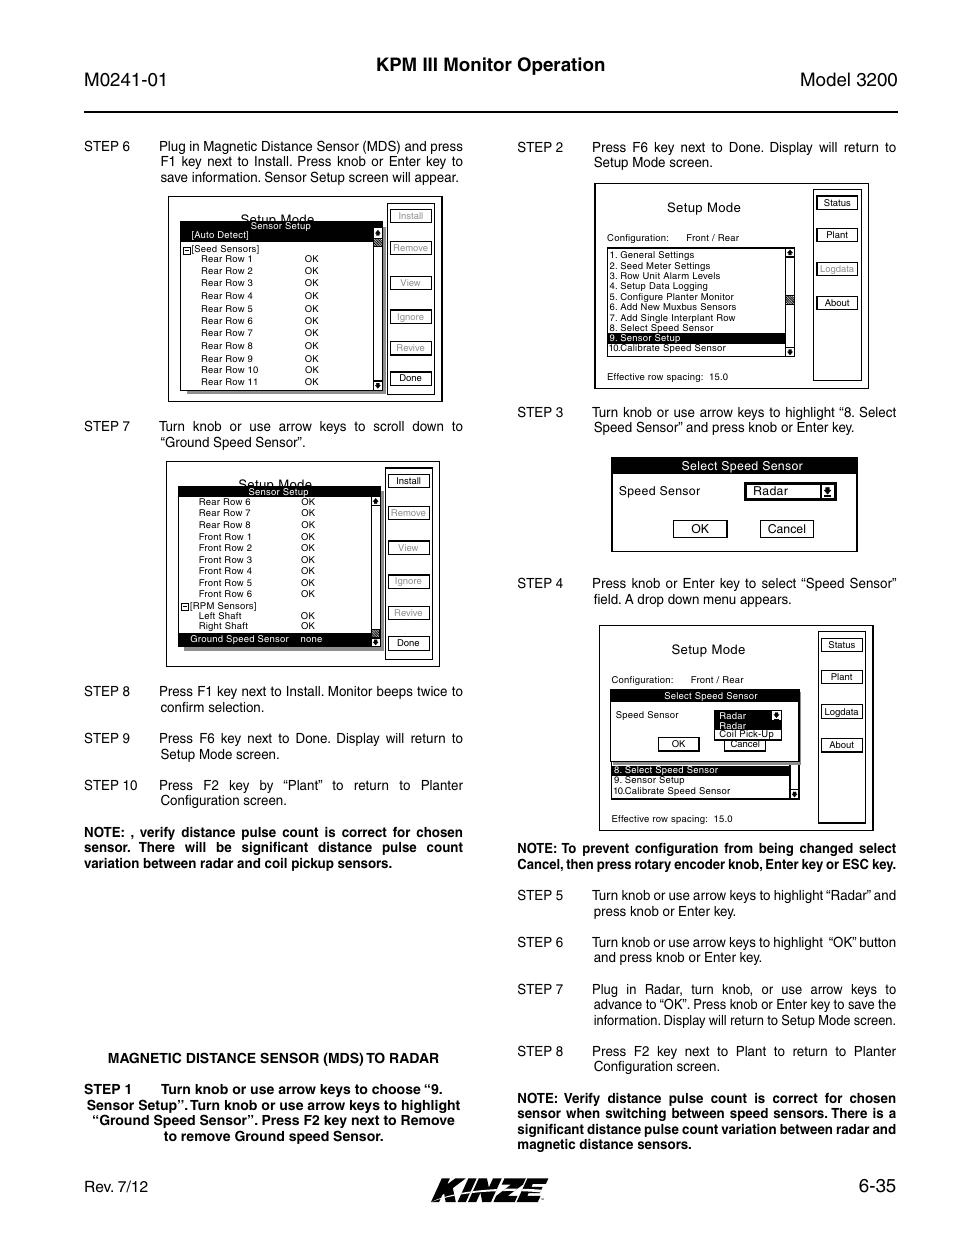 35 kpm iii monitor operation, Setup mode, Rev. 7/12 | Kinze